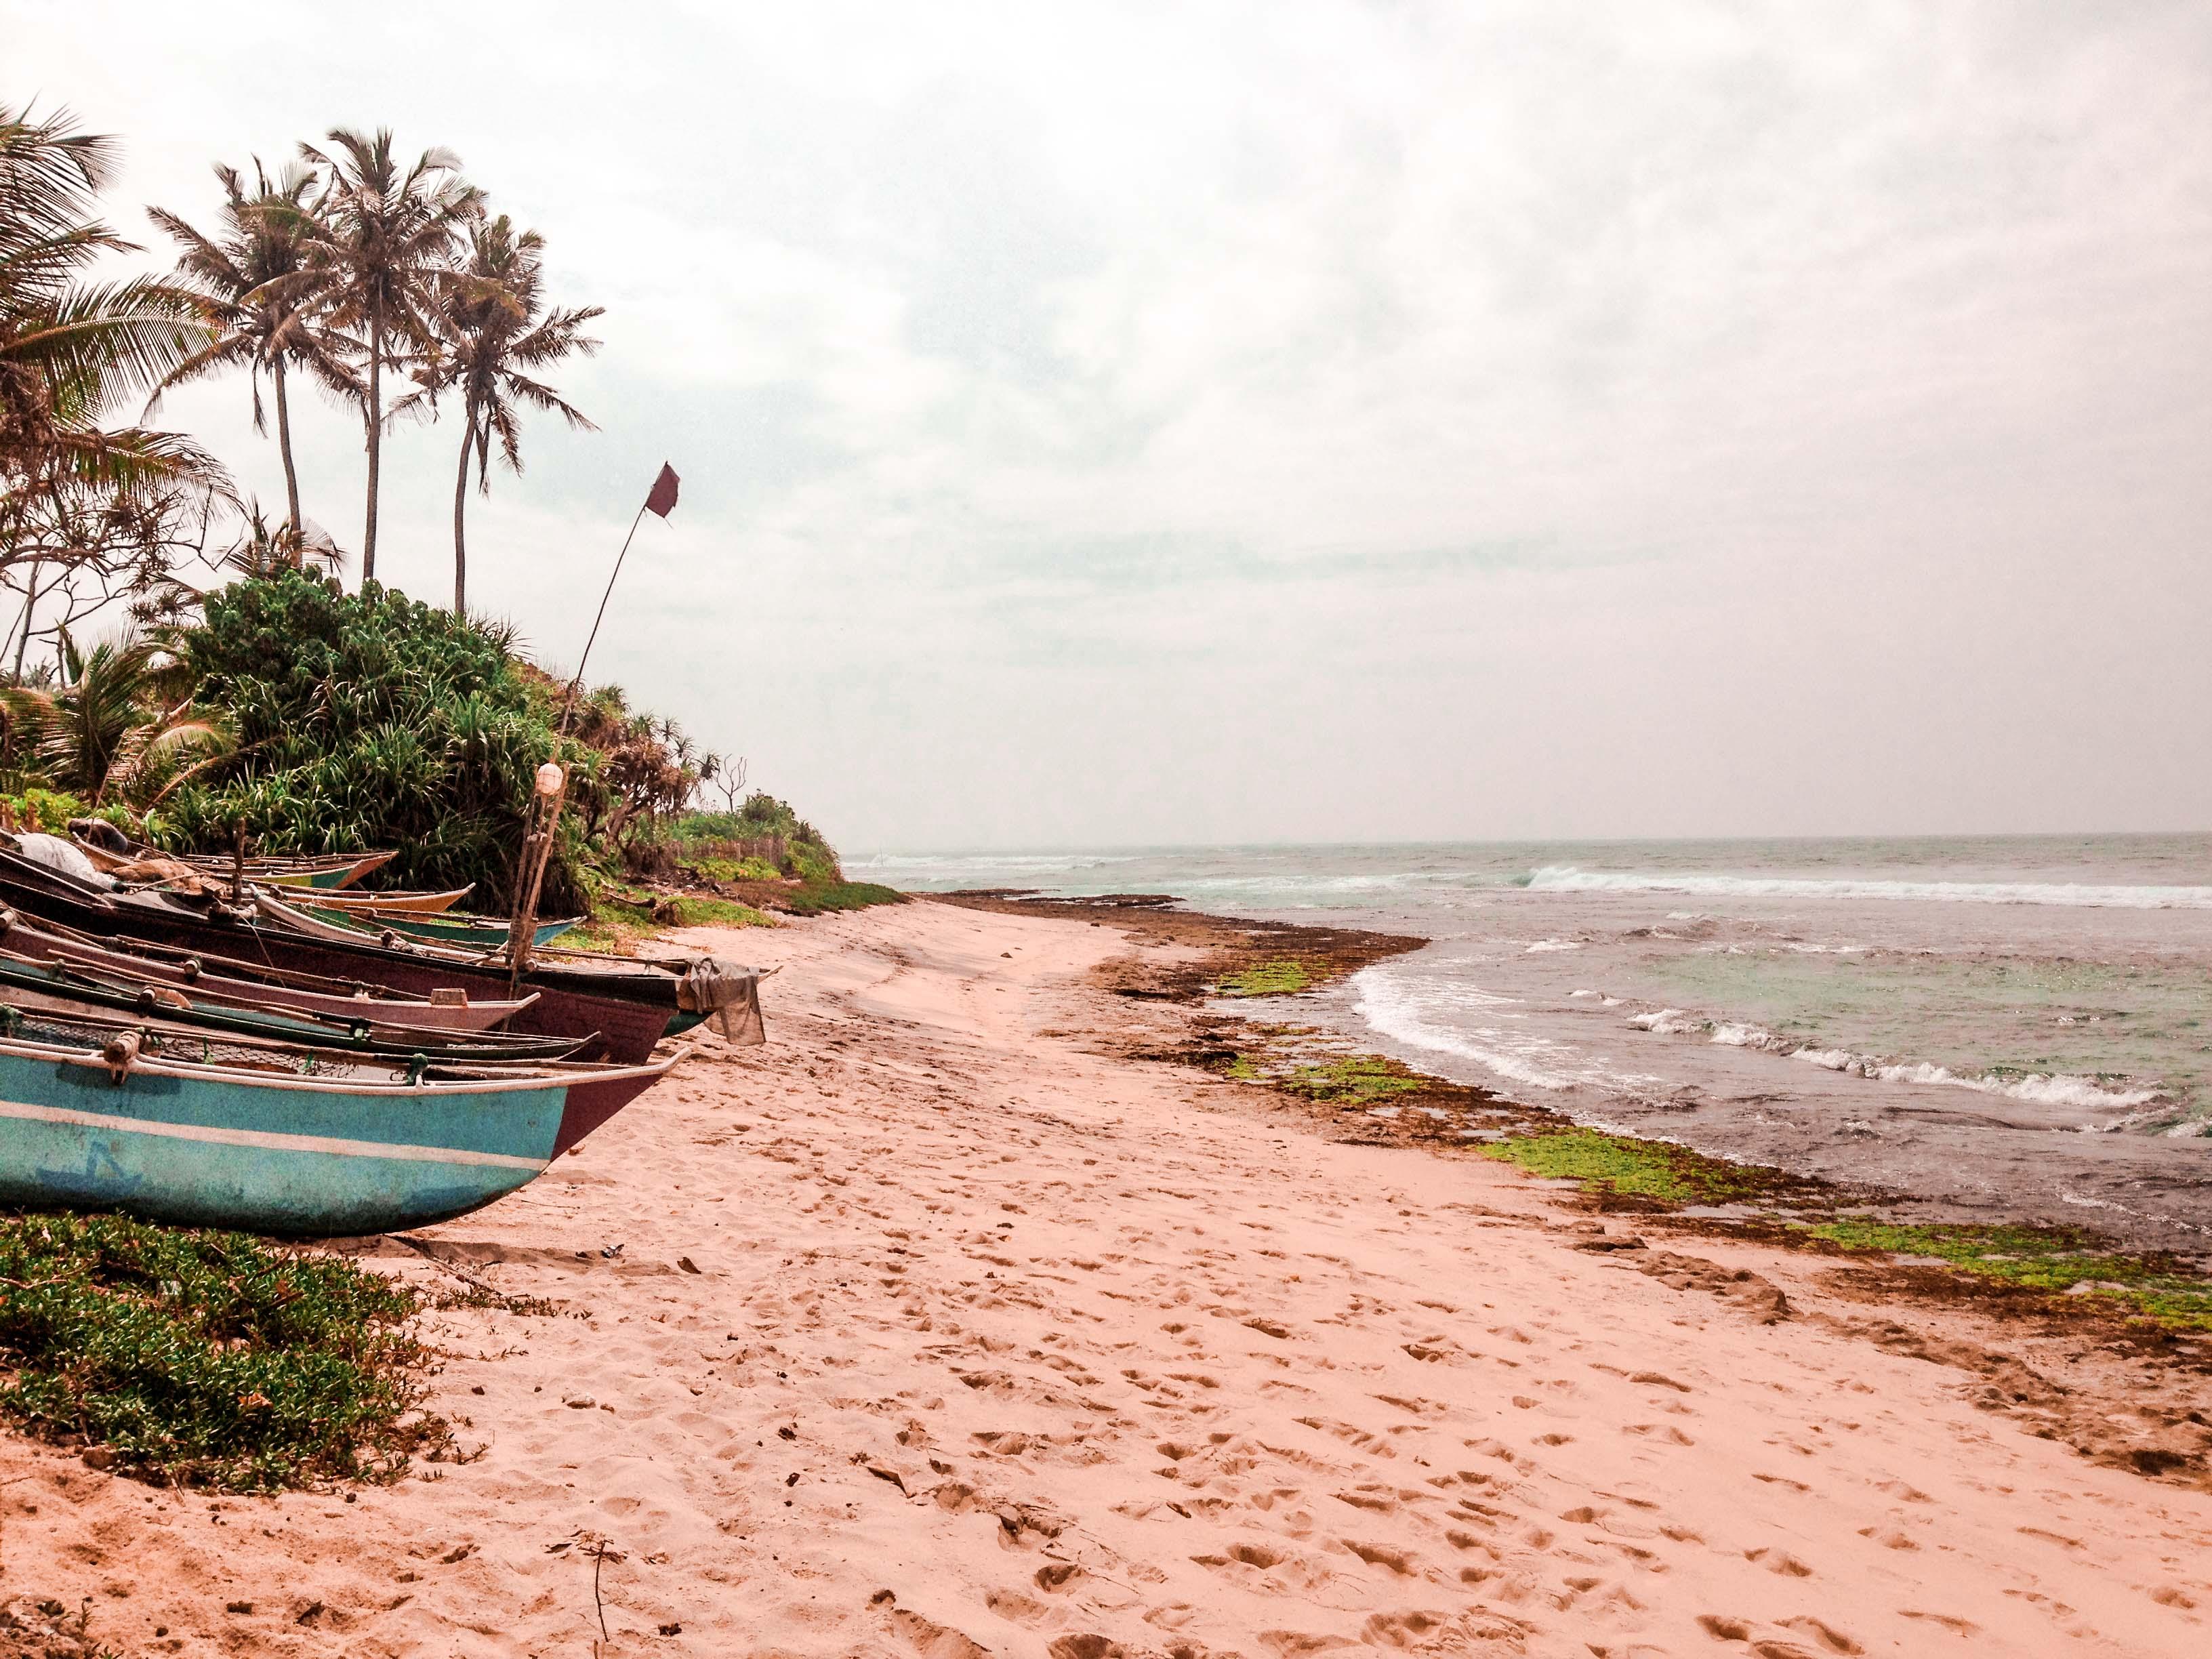 Sri Lanka Reisezeit , Anreise & Visum - Top Sri Lanka Tipps